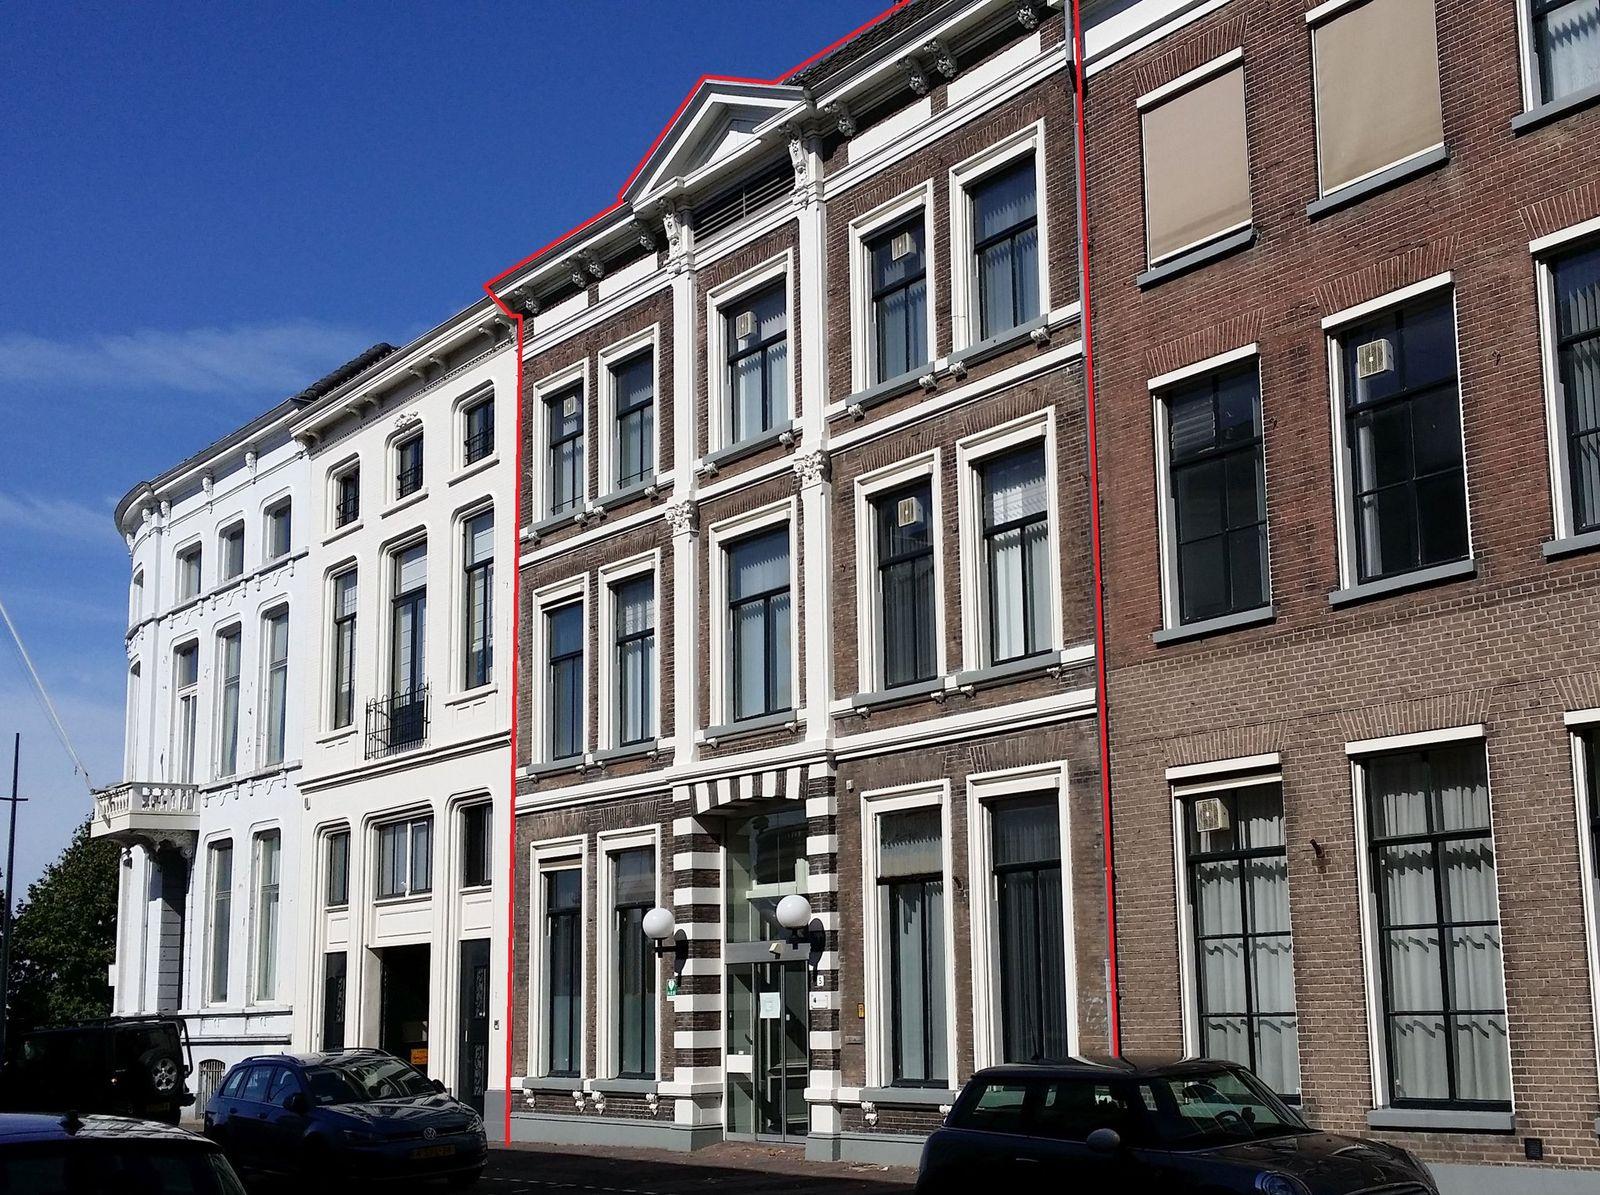 Marspoortstraat 7-b, Zutphen